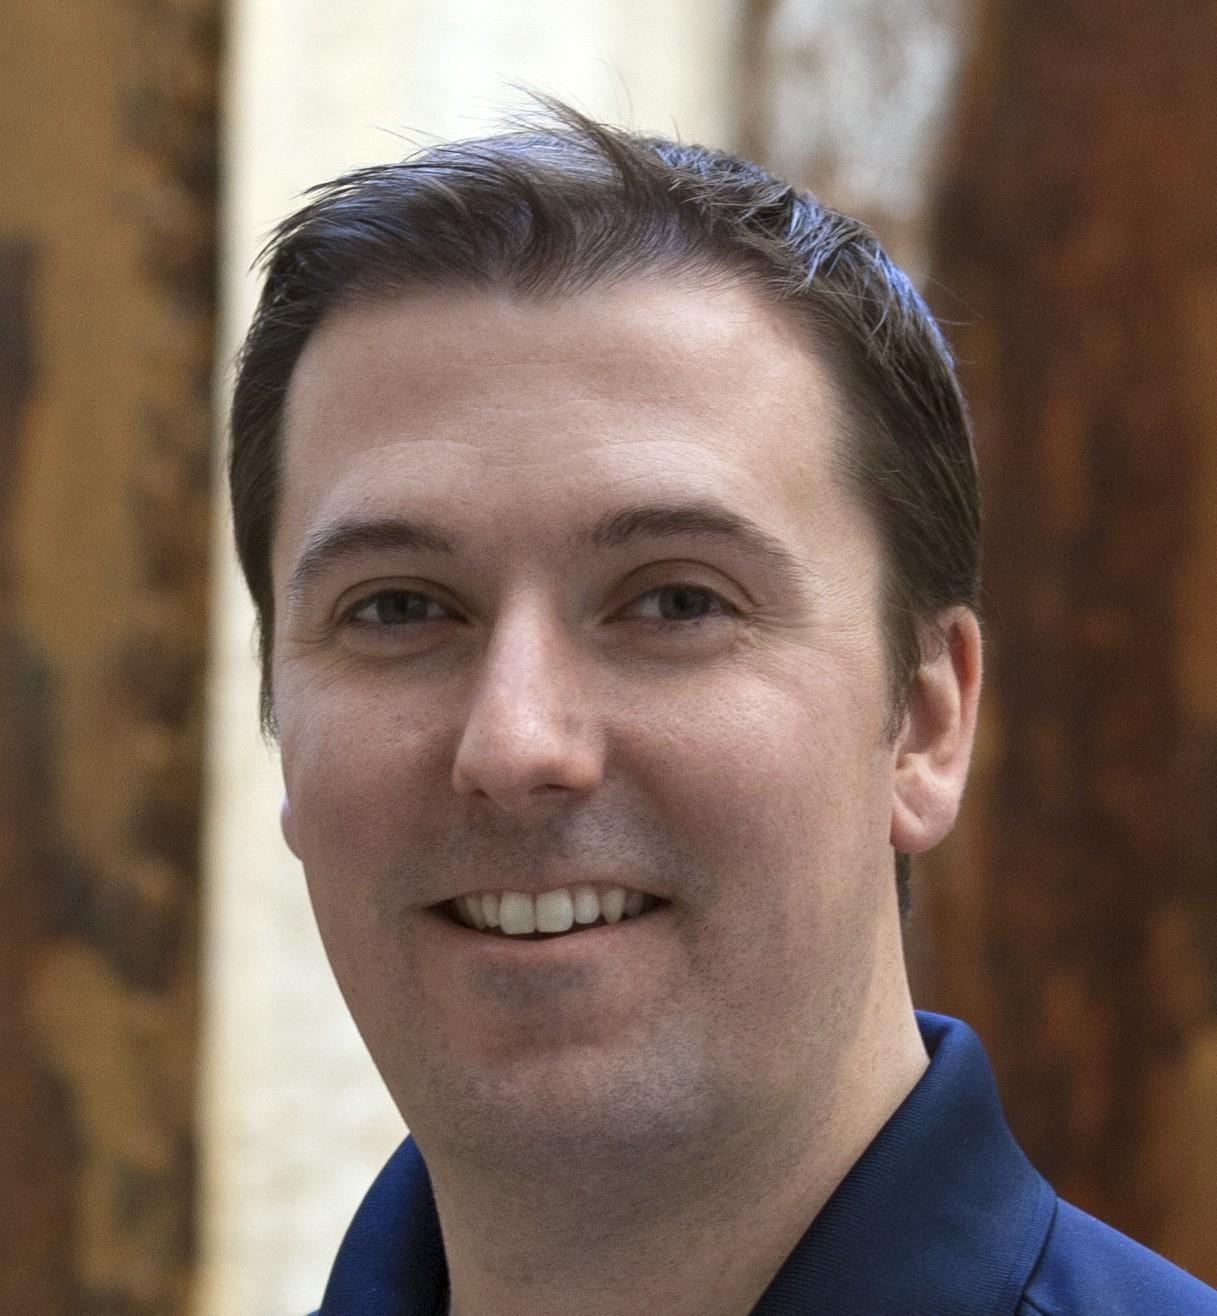 Ken Downs | Manager of Scholarship Universe, University of Arizona